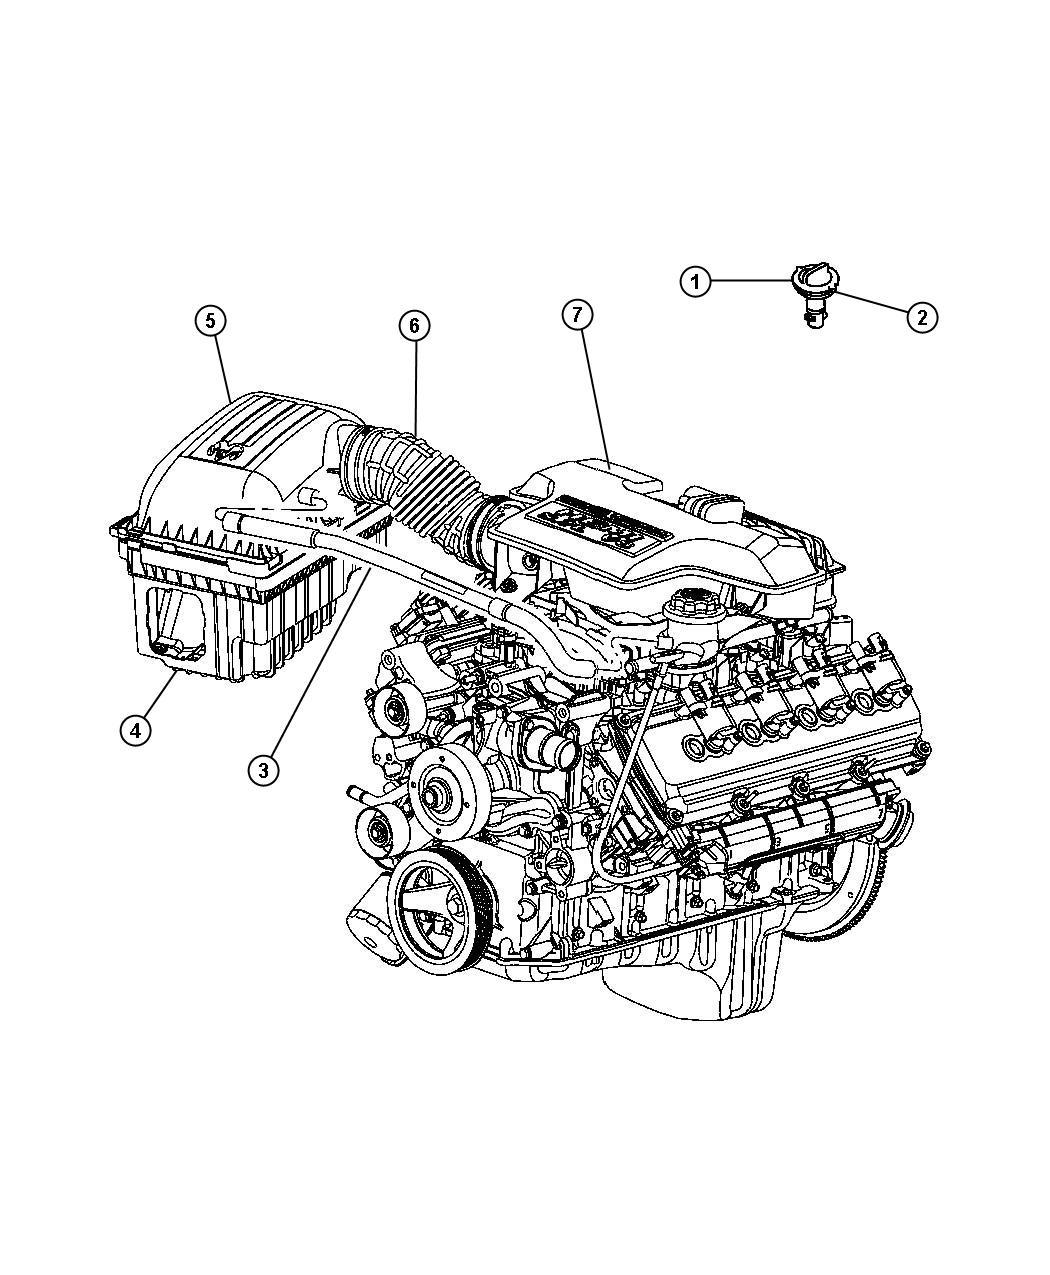 2005 Dodge Magnum R/T 5.7L Hemi V8 Valve. Crankcase vent